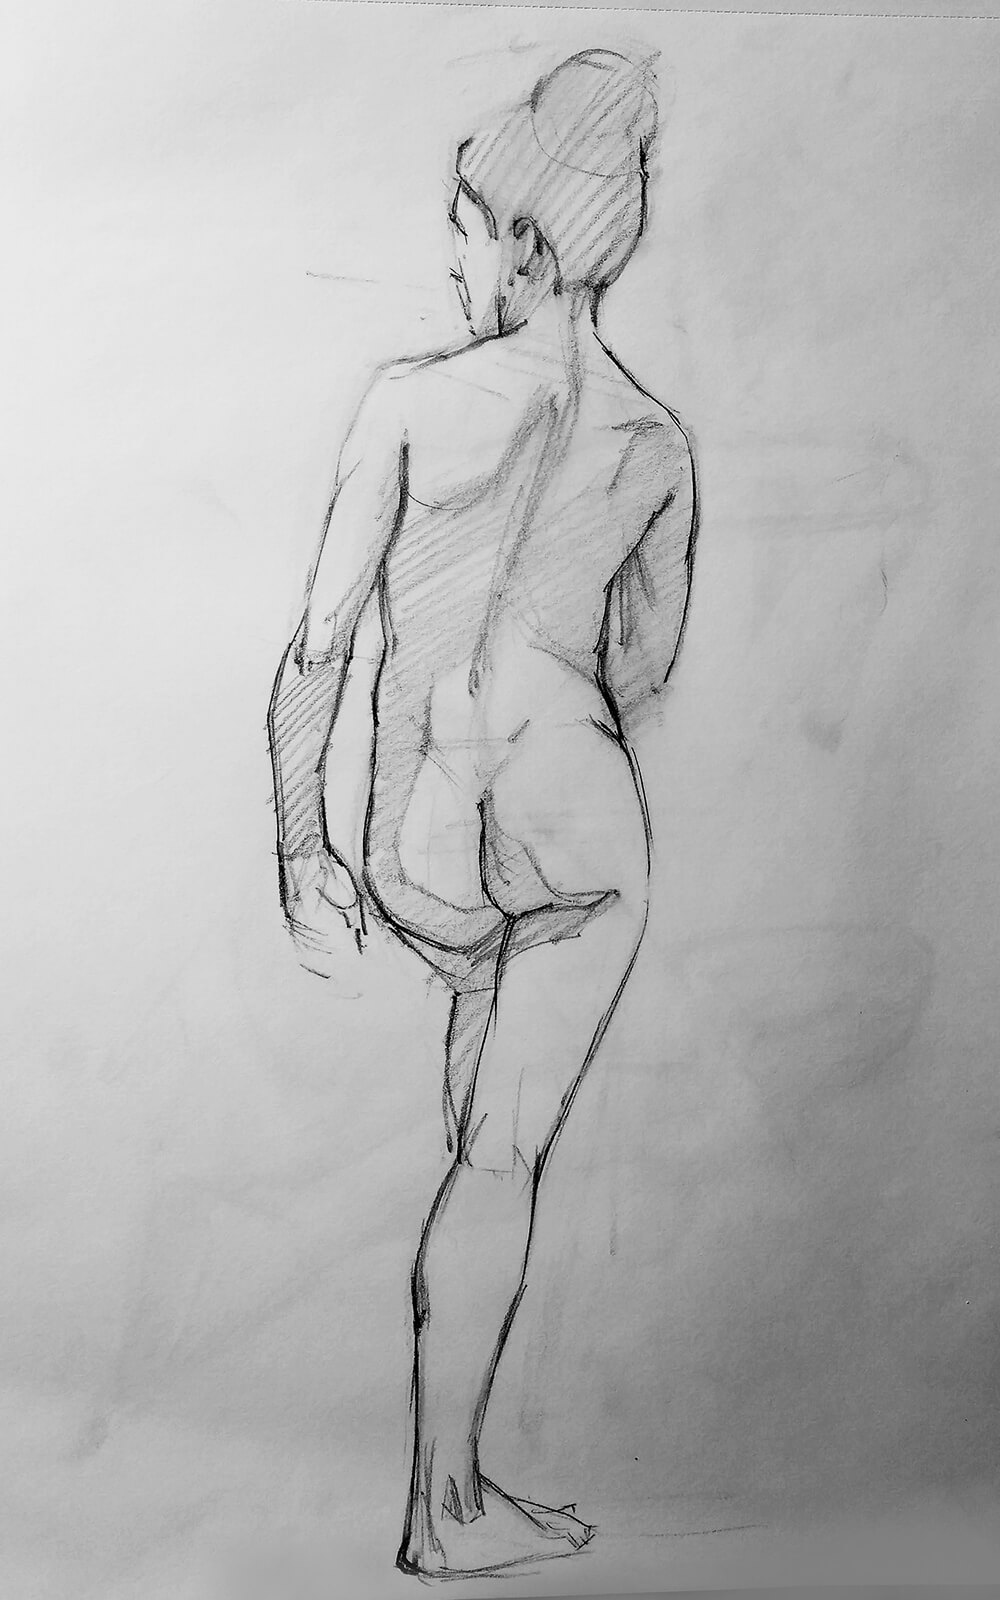 Dibujo Figura. Diego Catalán. Estudio Nigredo - Academia de Pintura y Dibujo